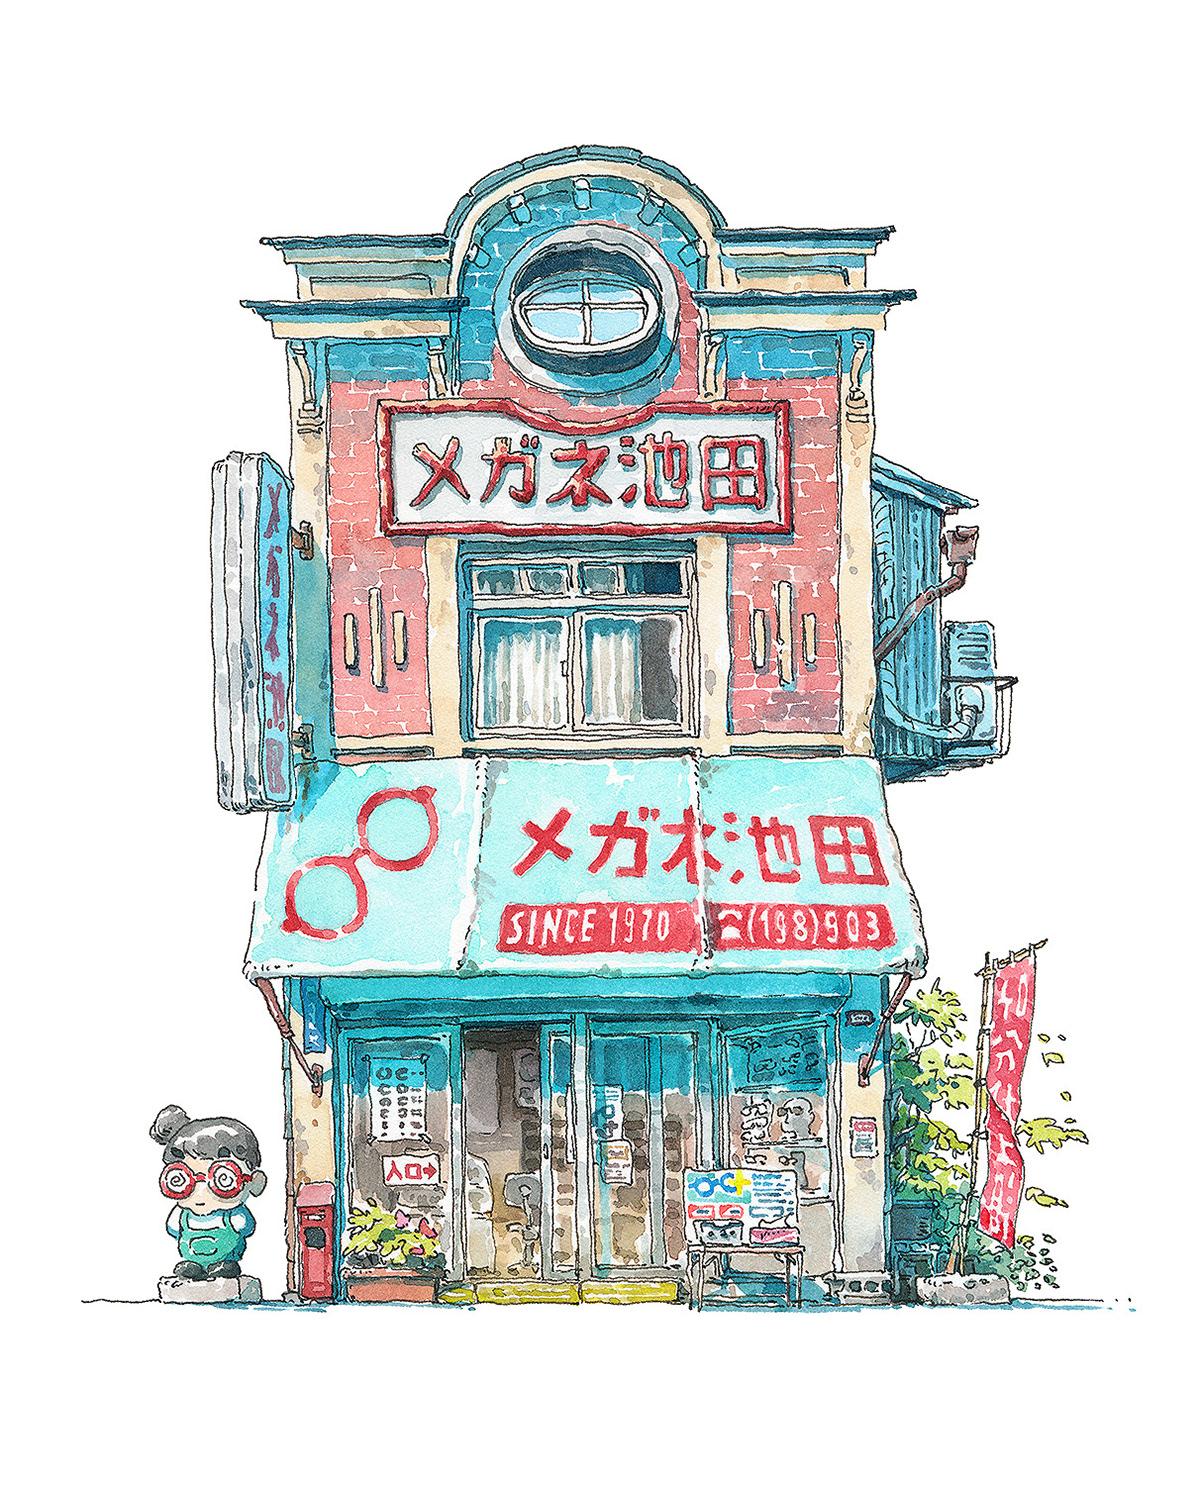 Digital Watercolor Paintings of Tokyo Storefronts